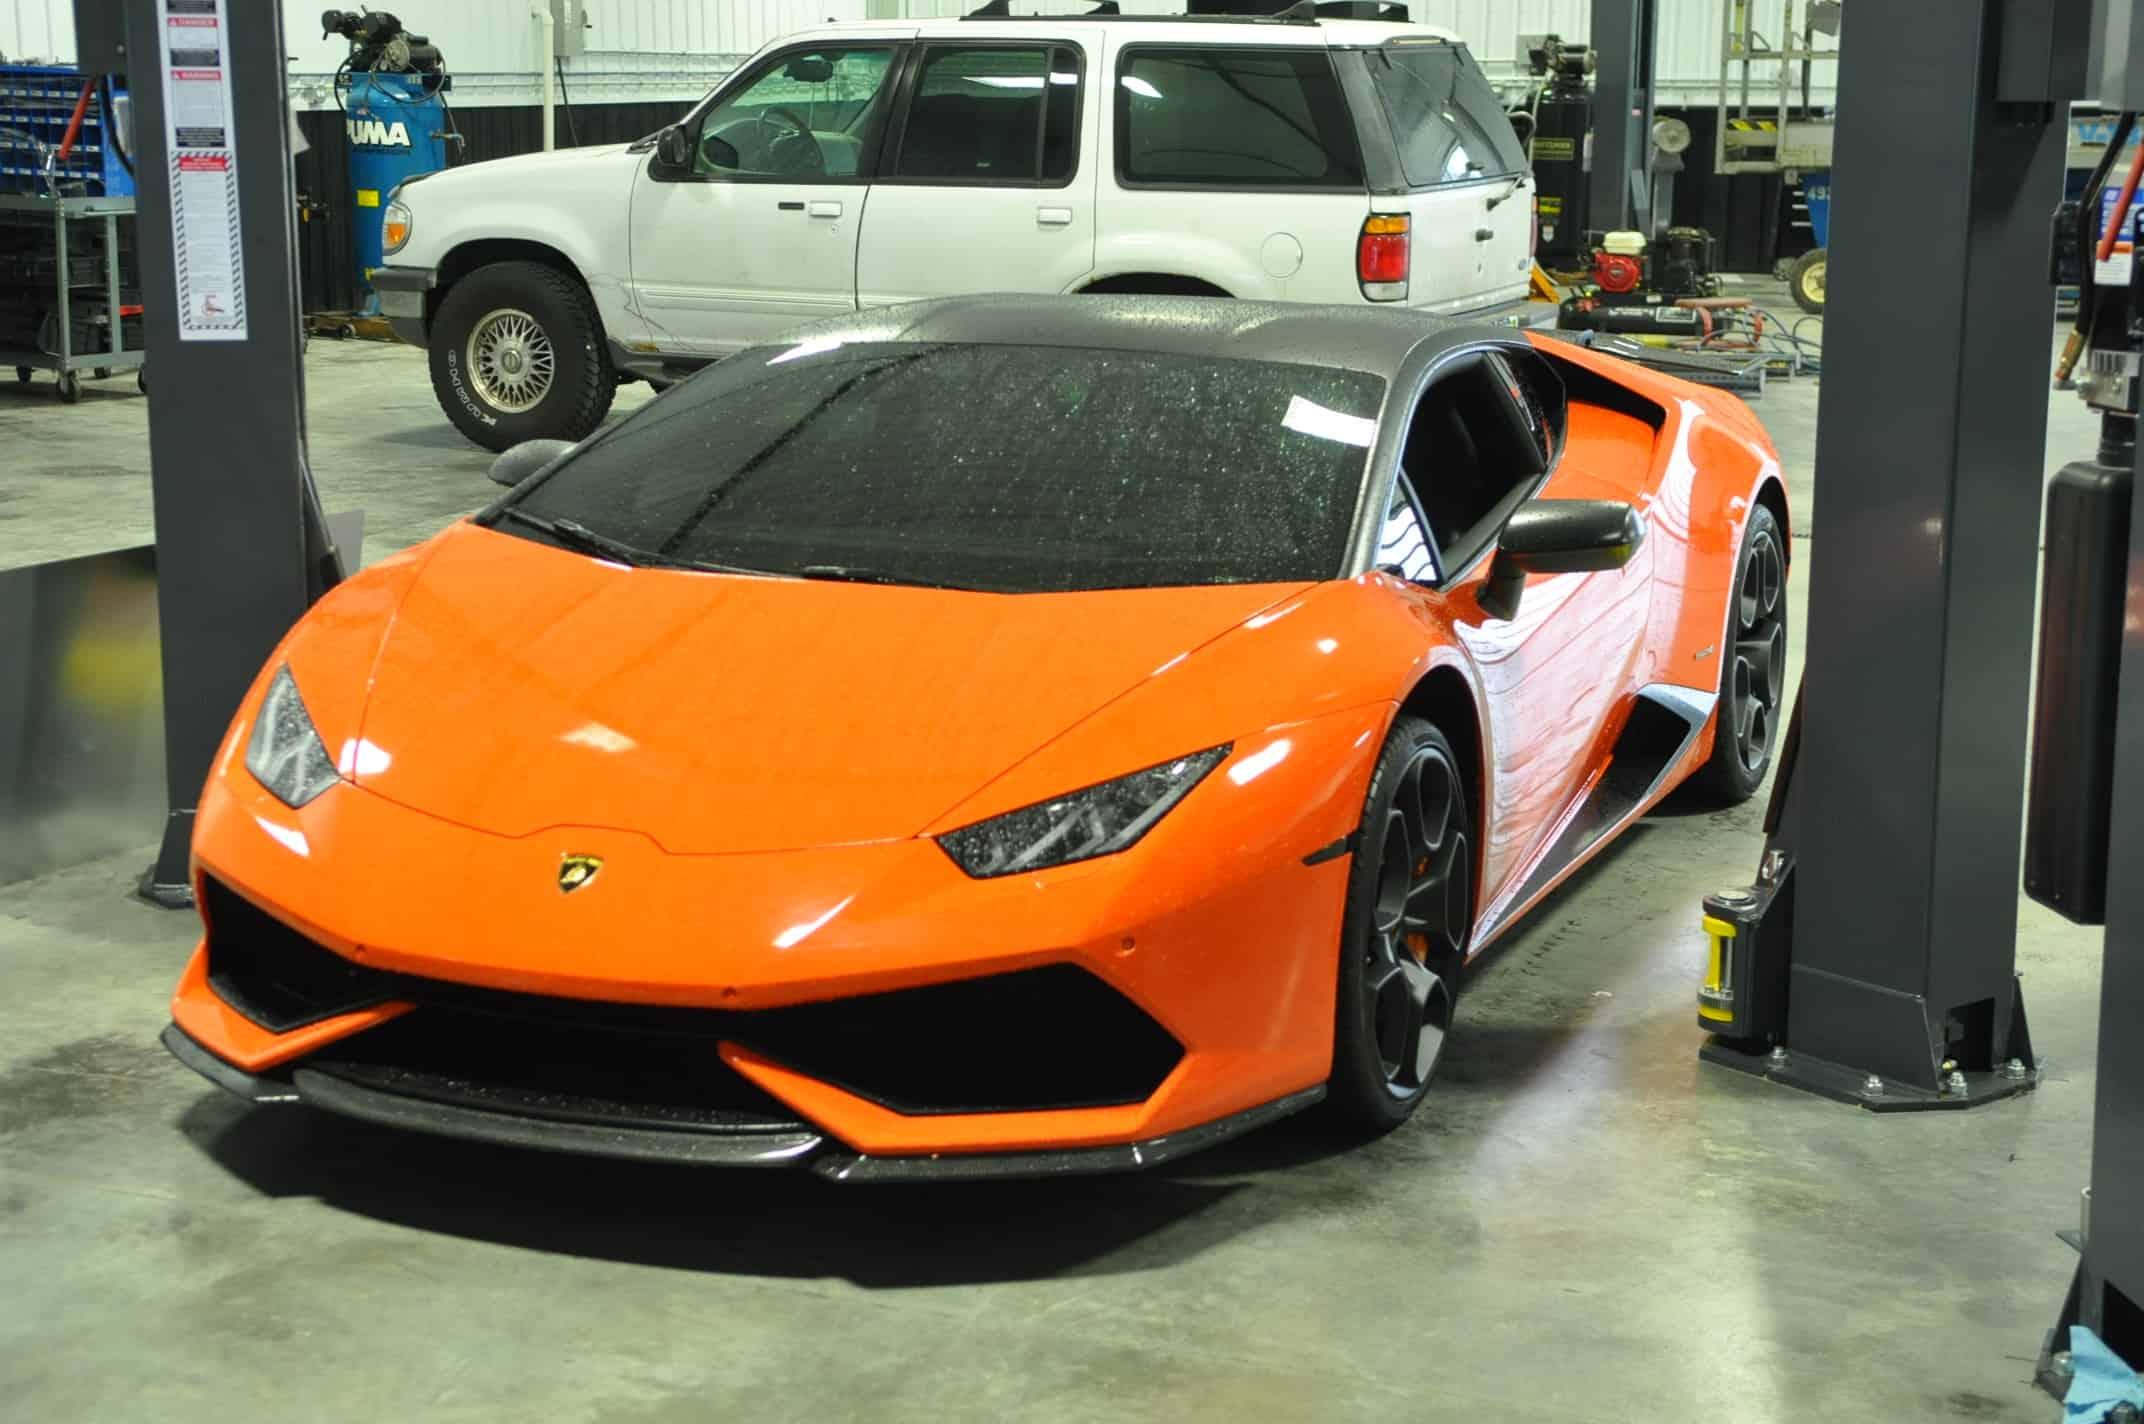 Lamborghini Huracan Tire & Powdercoating In Naperville